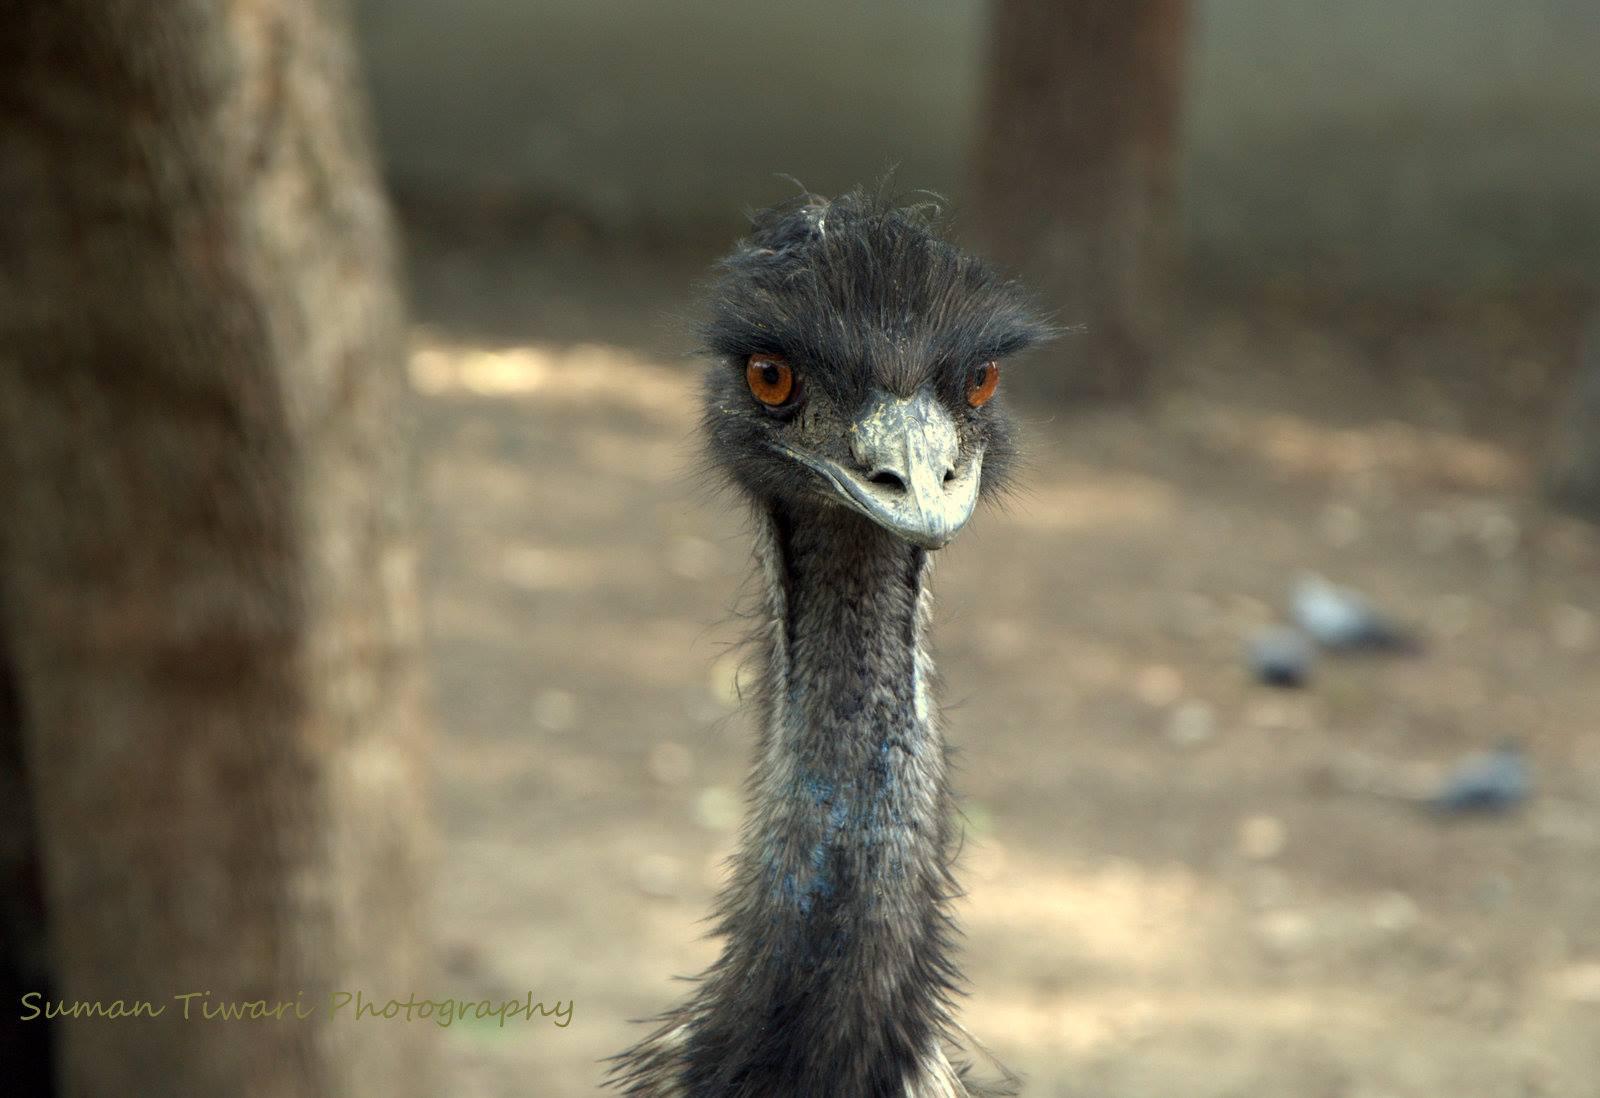 EMU Bird Farming_Suman Tiwari Photography_Zeynep Didem Akinoglu